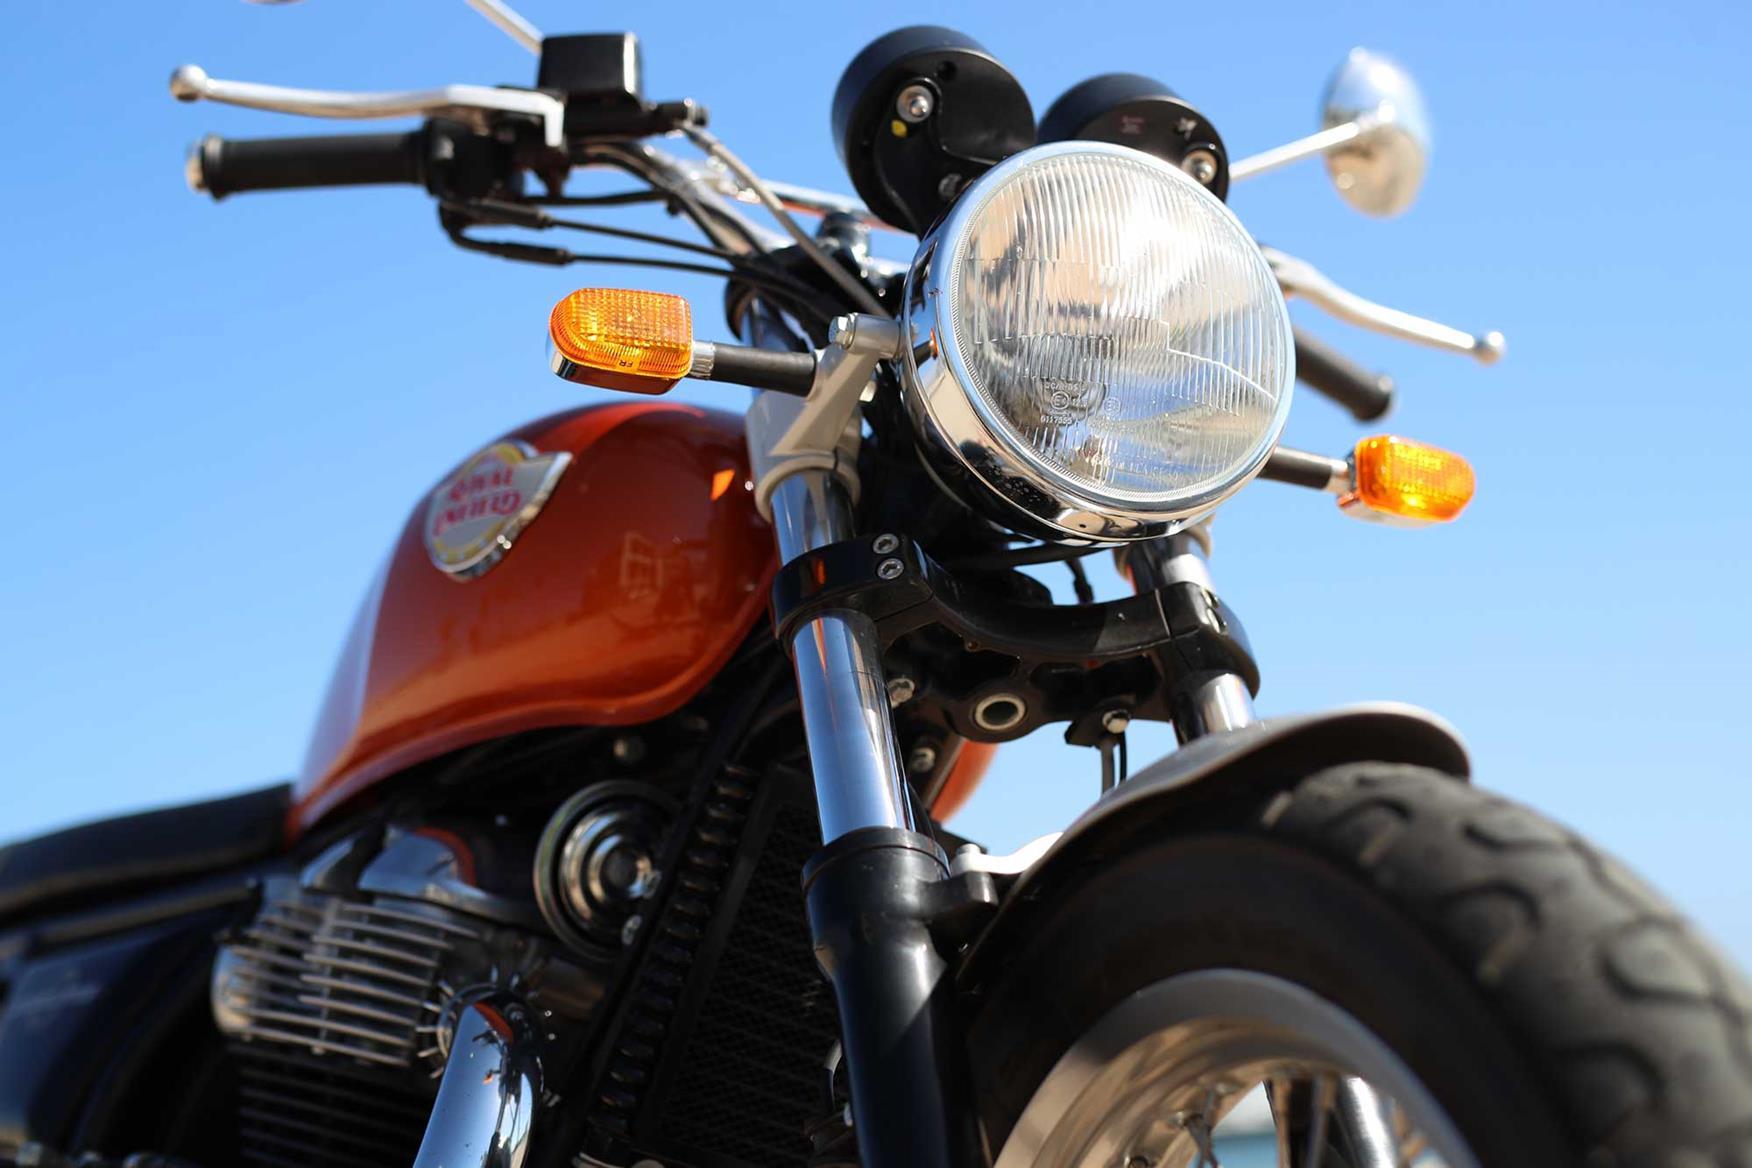 Motorcycle Dealer Near Me >> ROYAL ENFIELD INTERCEPTOR 650 (2018-on) Motorcycle Review ...